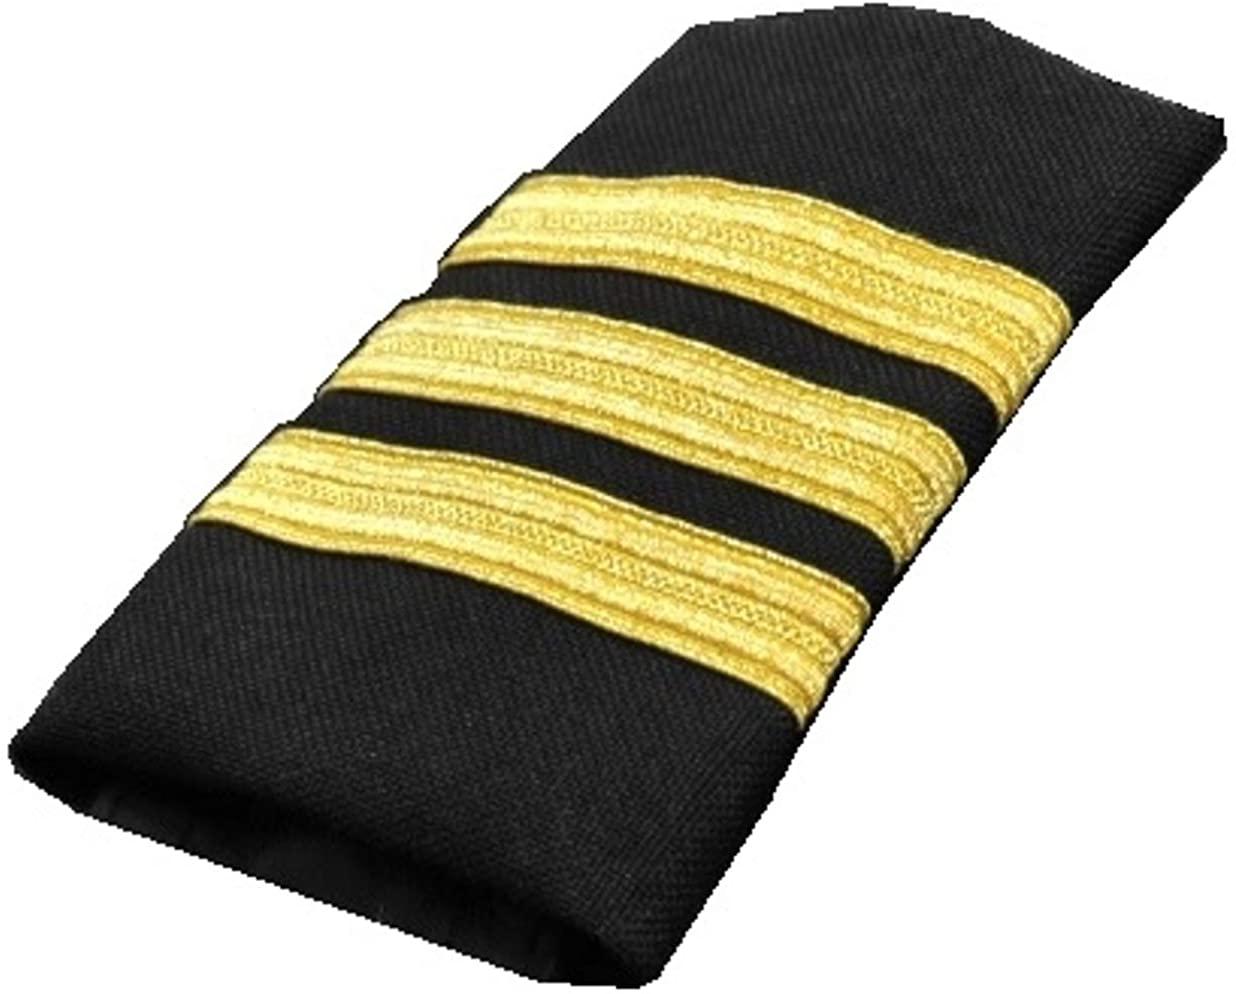 AeroPhoenix - Pilot Three Bar Epaulets - First Officer- Gold Metallic on Navy